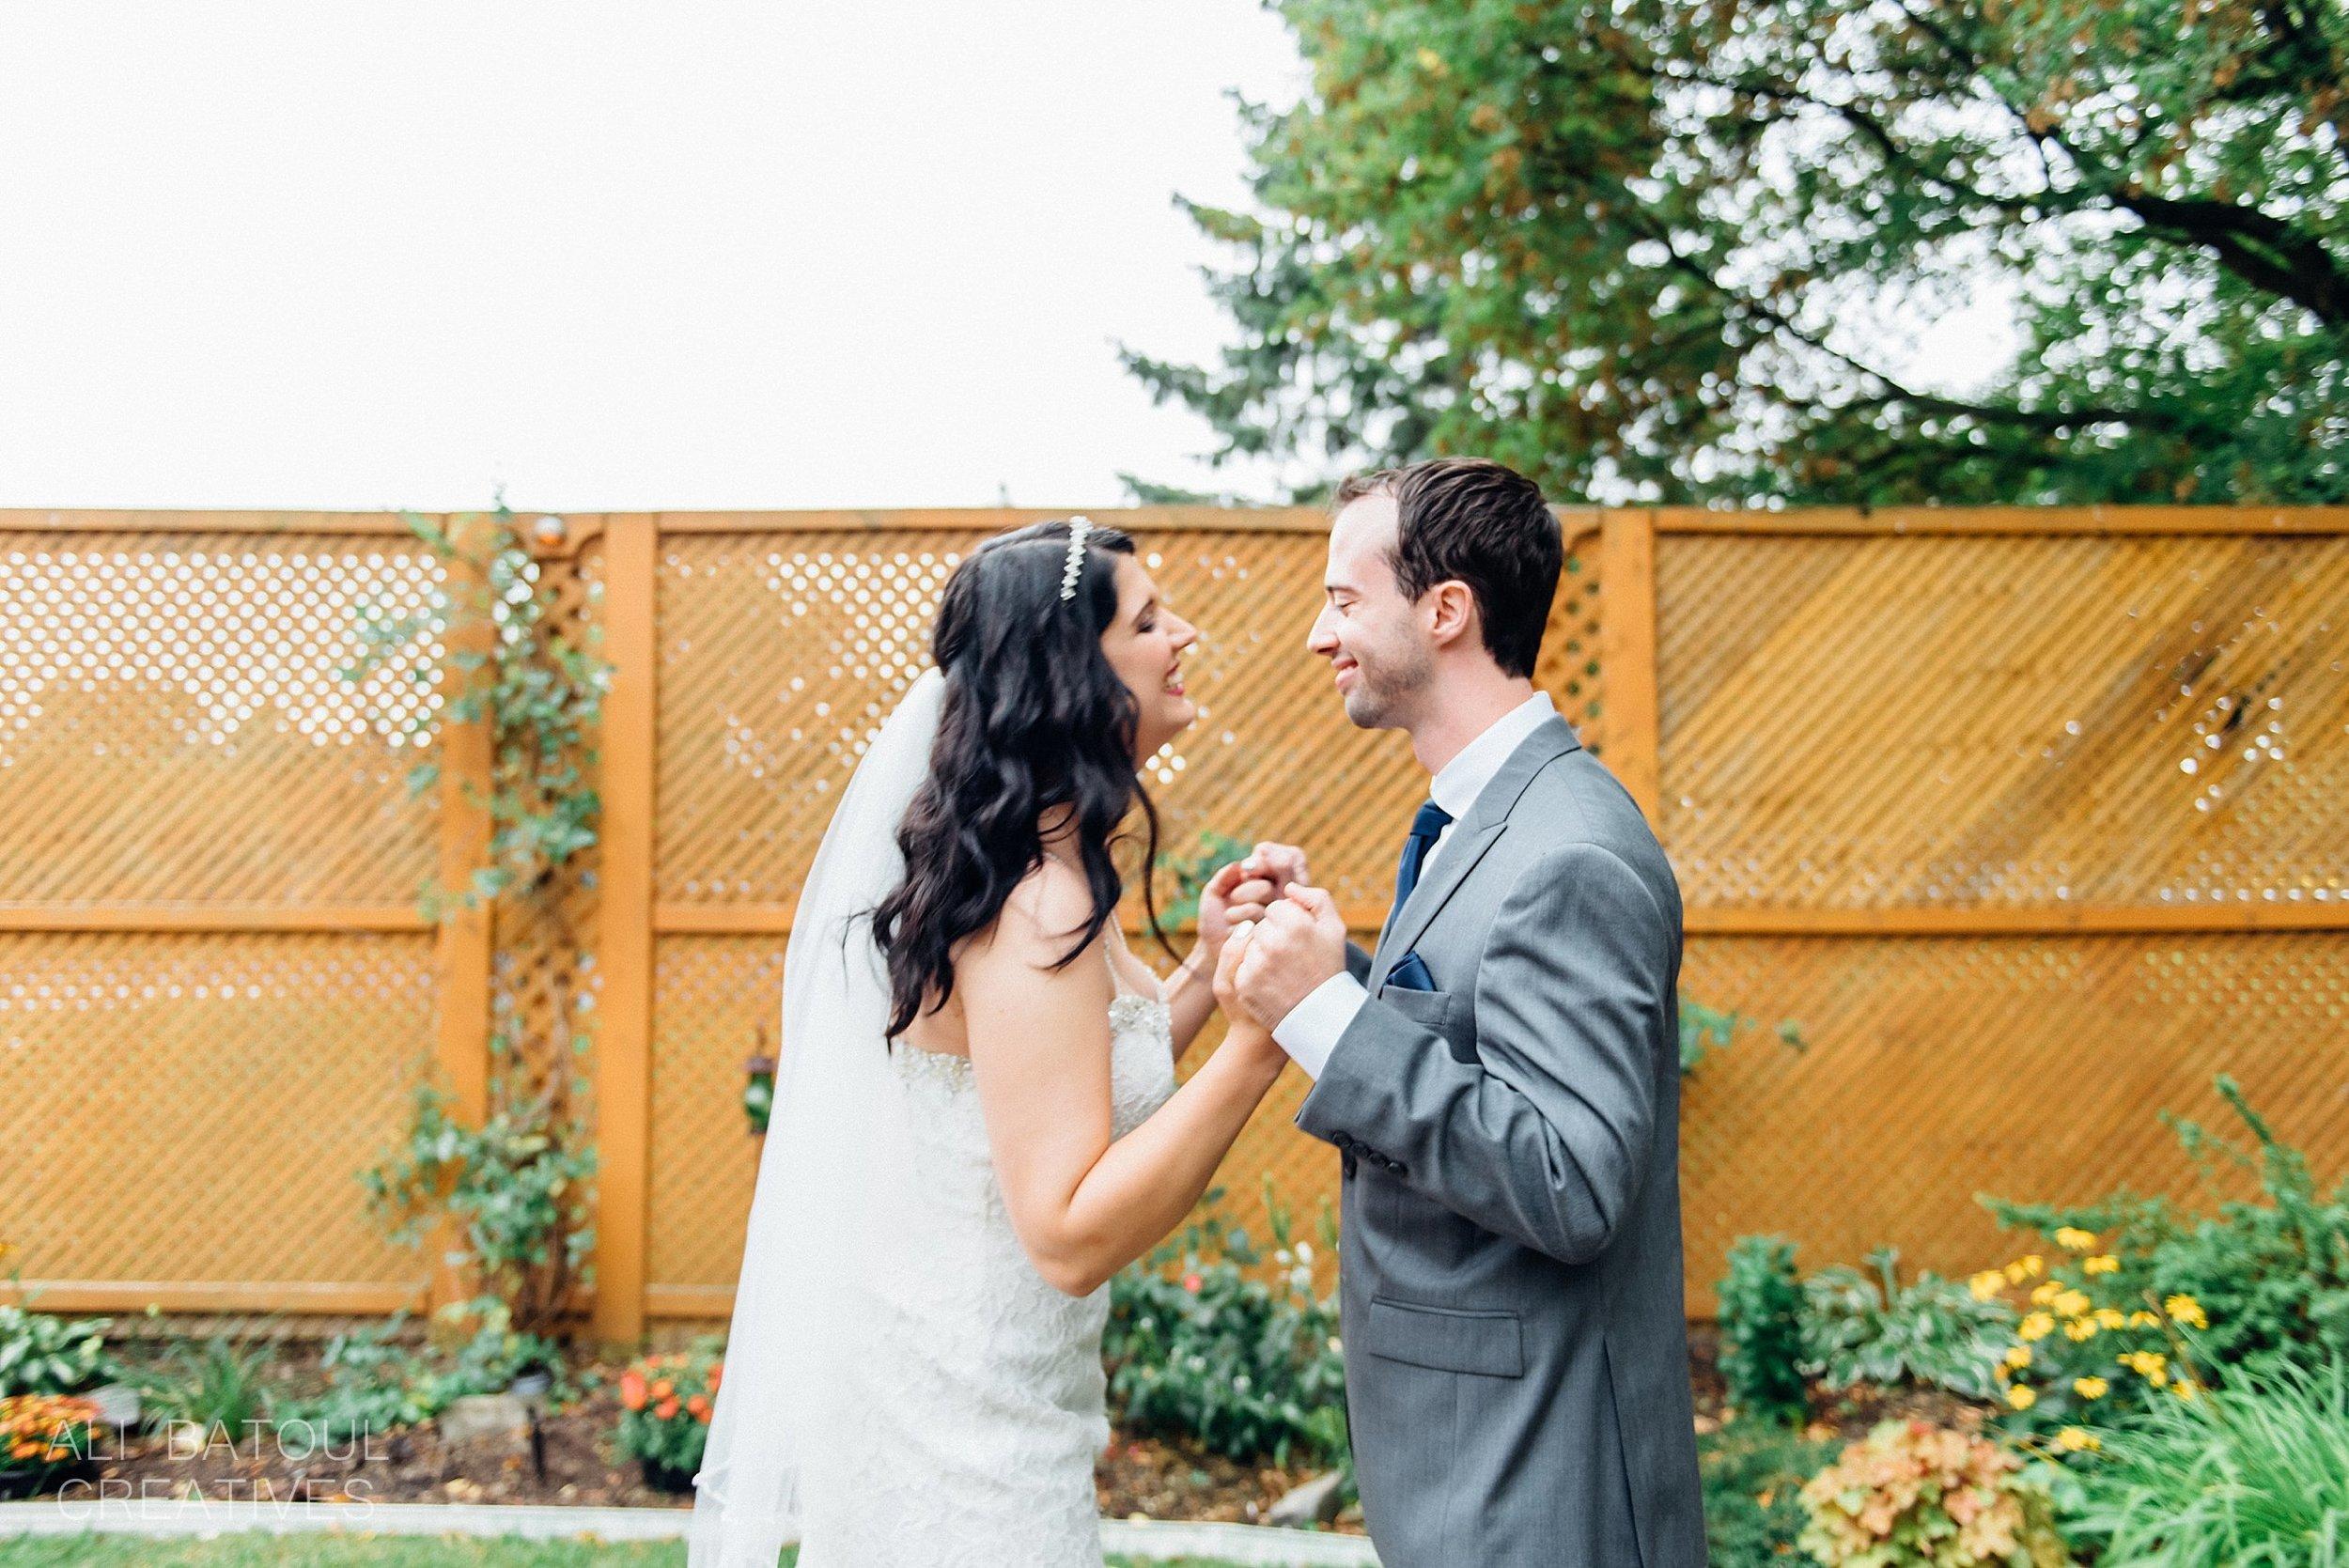 Jocelyn + Steve At The Schoolhouse Wedding - Ali and Batoul Fine Art Wedding Photography_0029.jpg